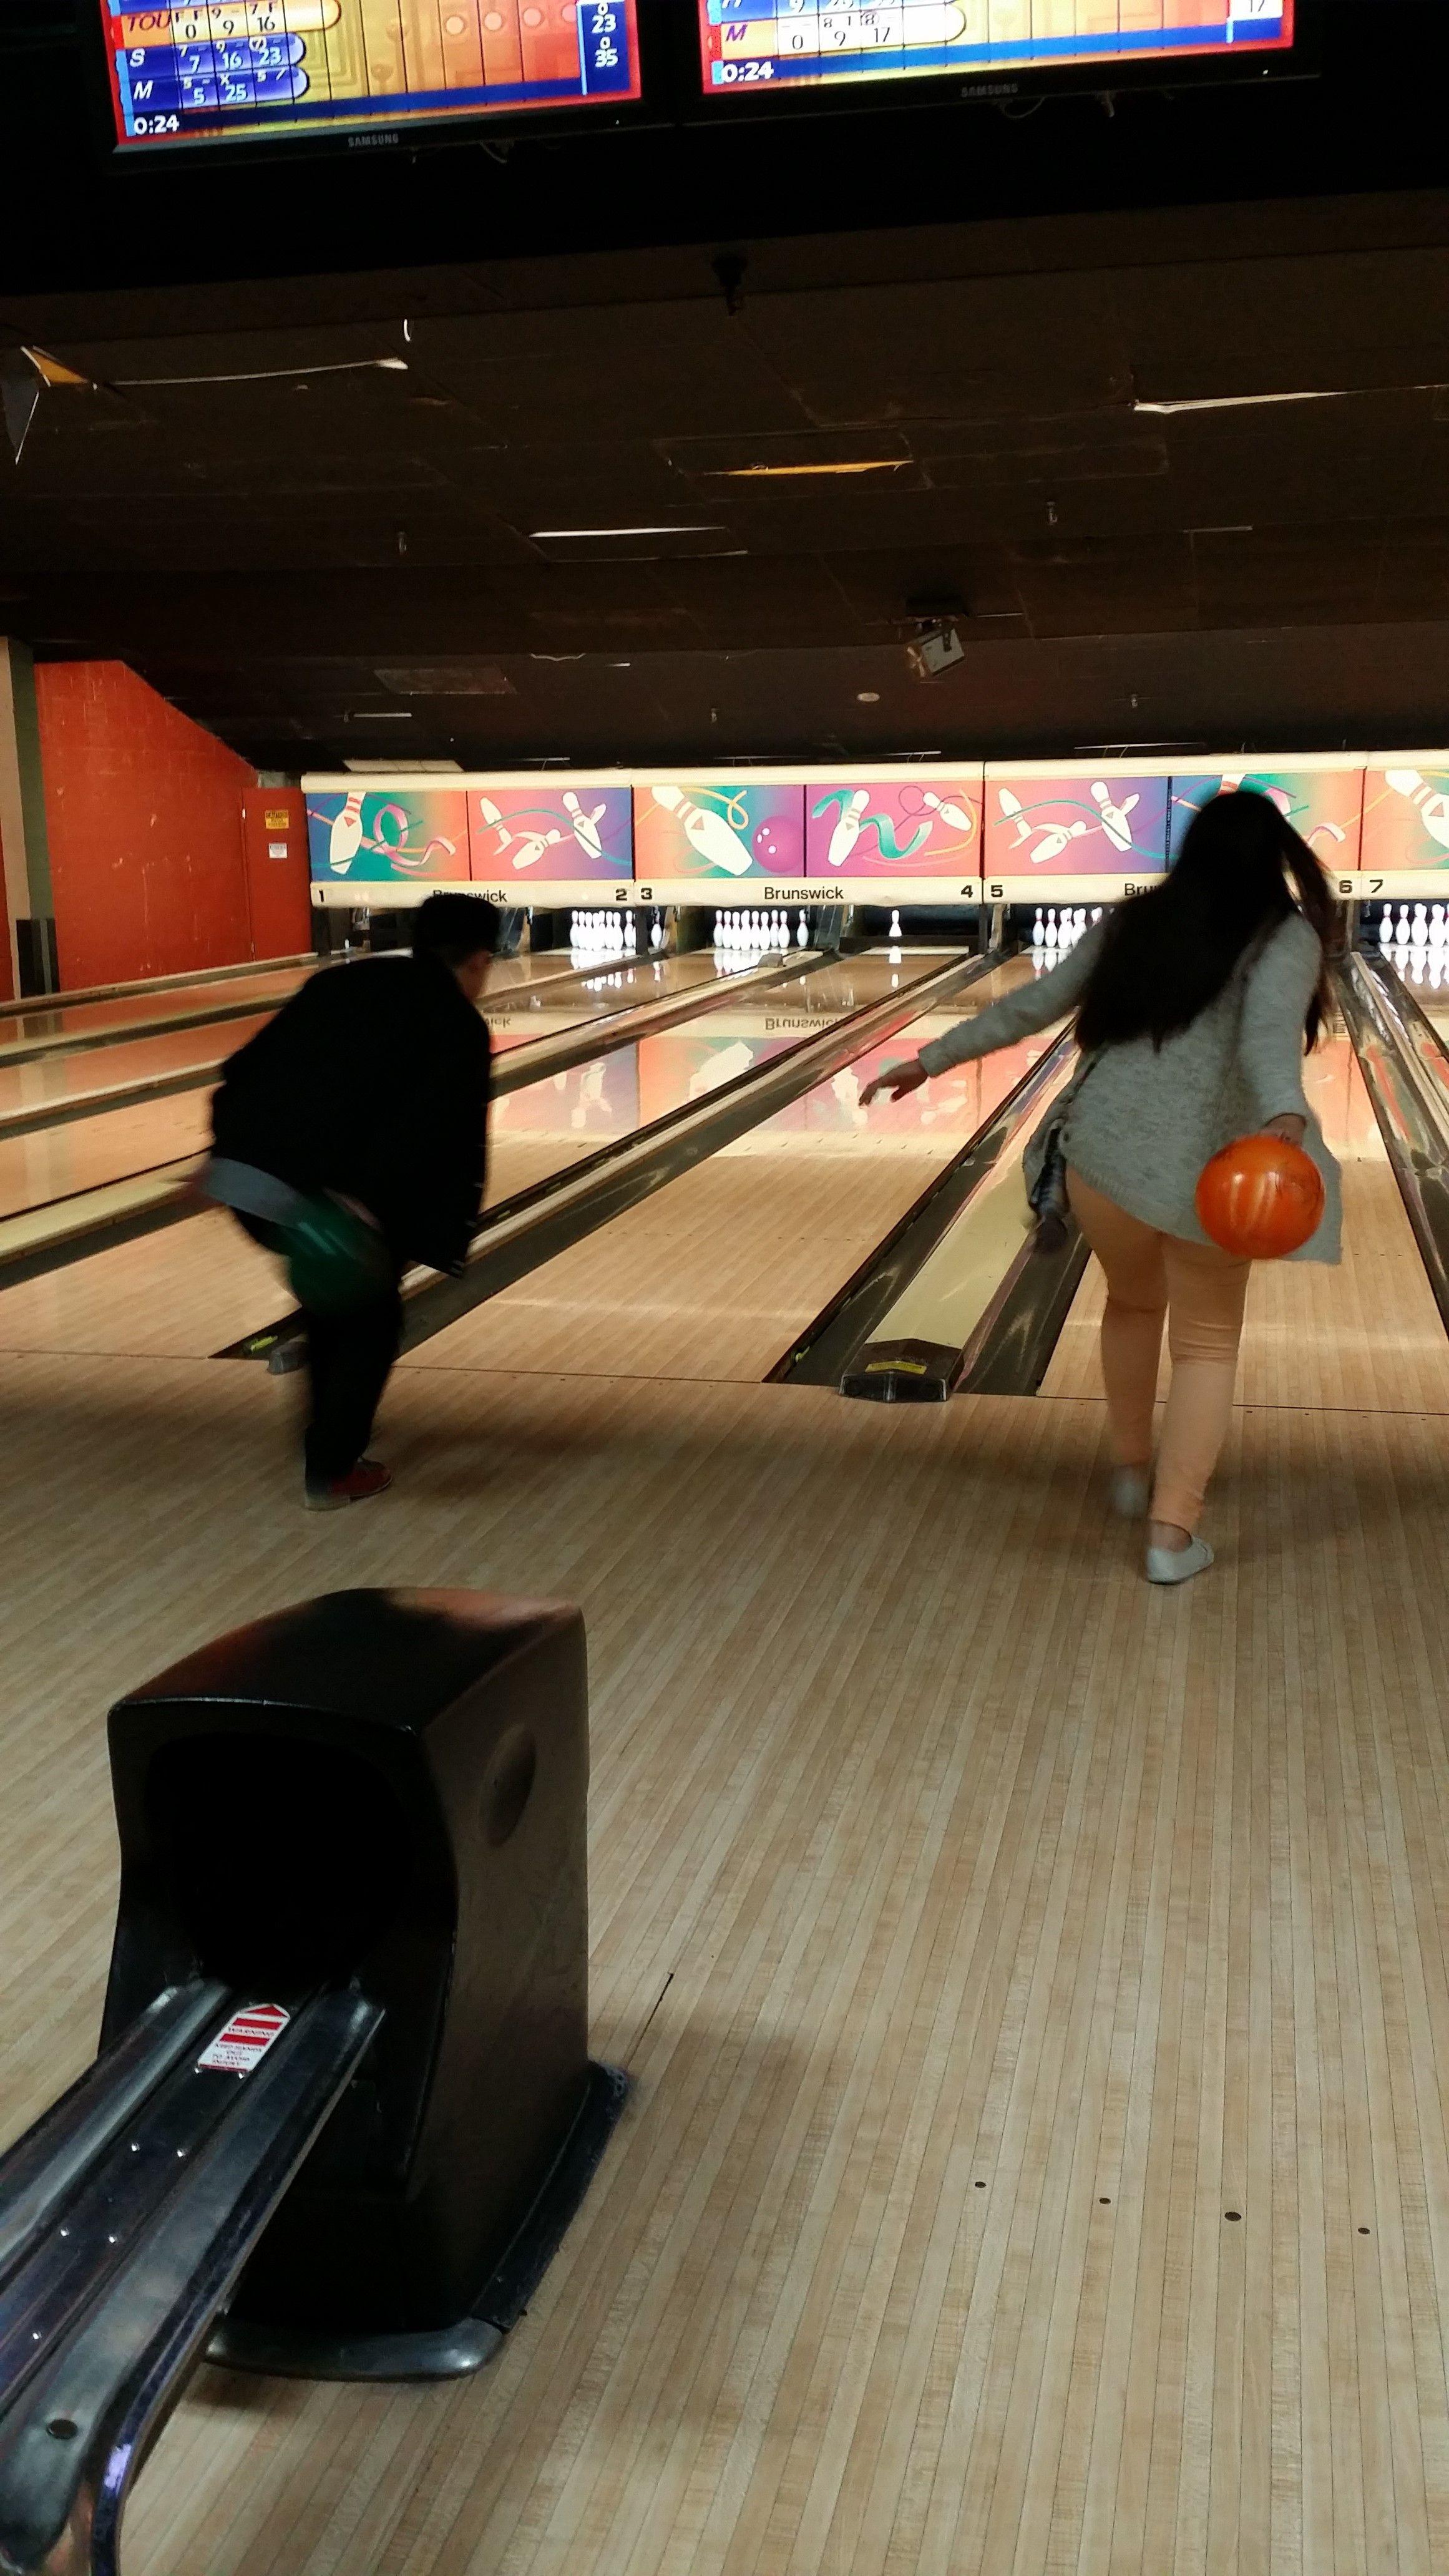 Folsom Lake Bowl 2014 Strikes Lanes Bowling Balls Bowling Shoes Friends Employee Appreciation Bowling Gym